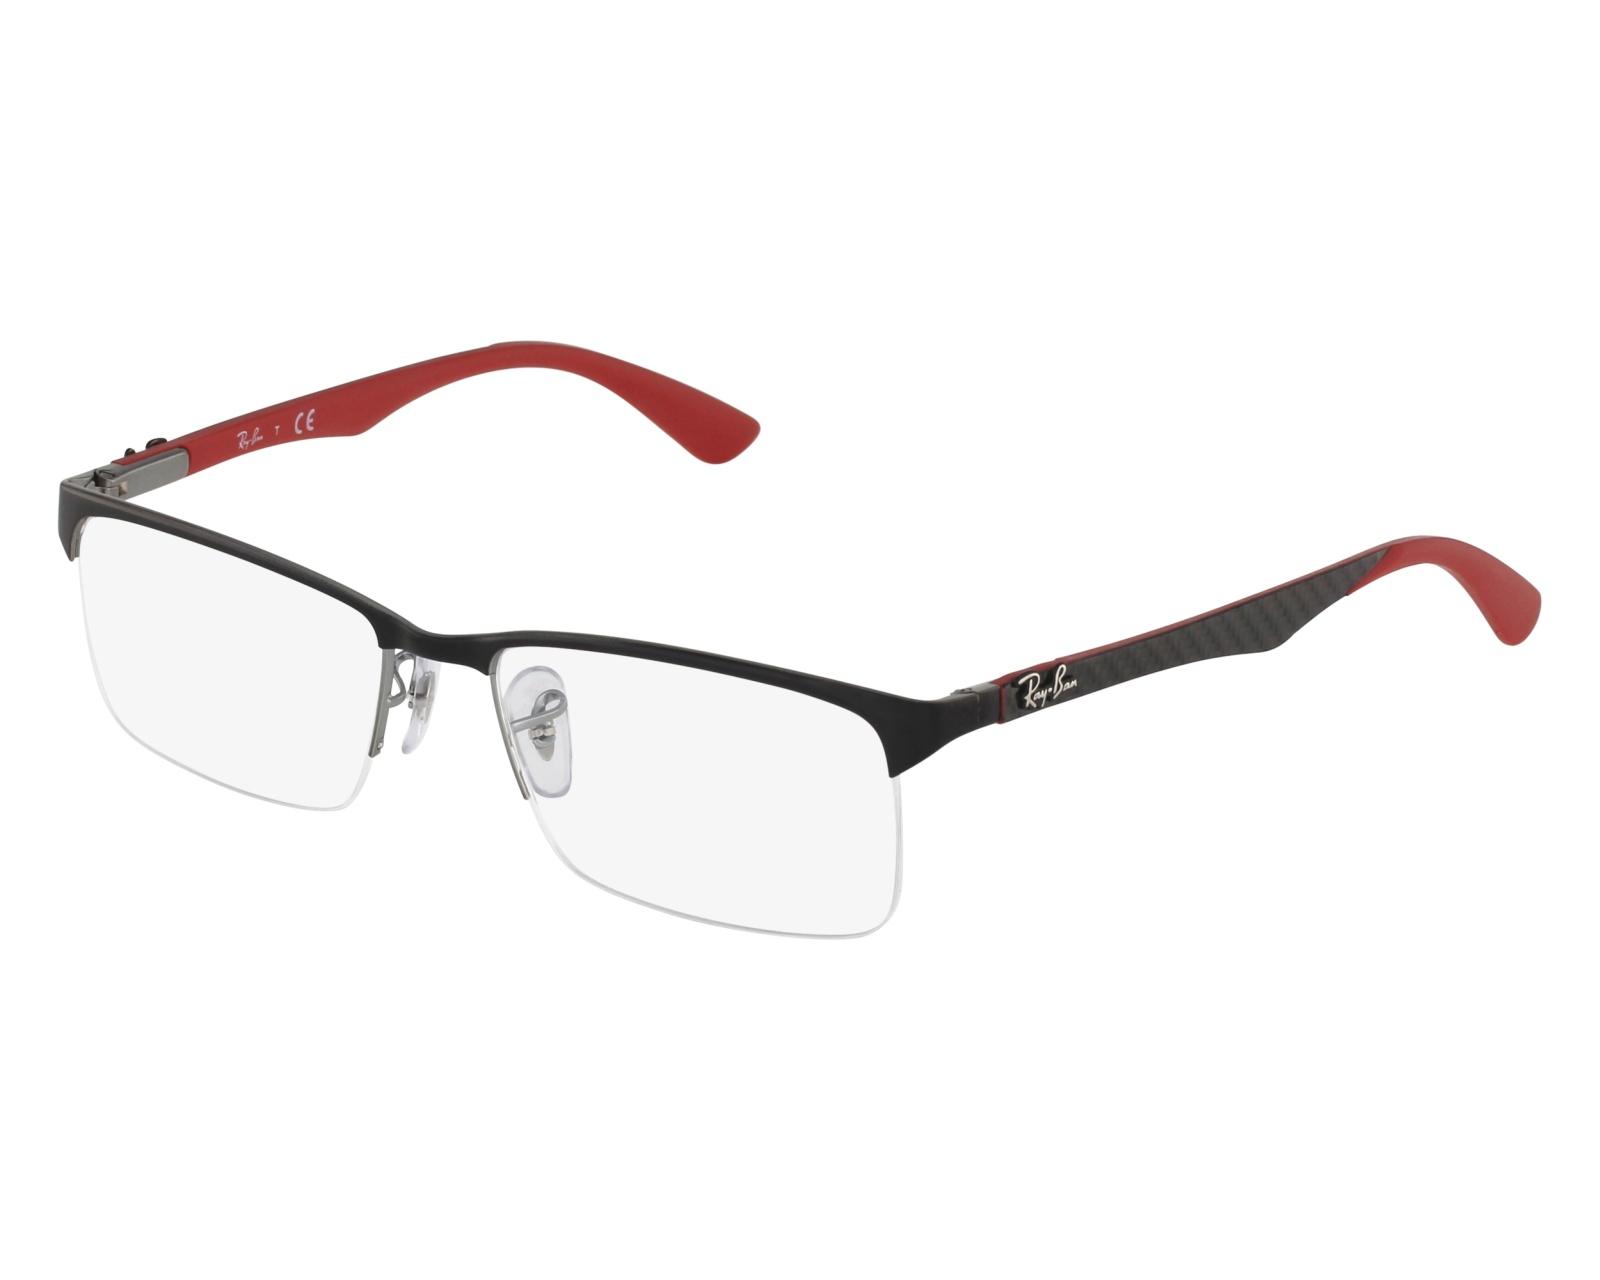 ce873d1b4b829 ... cheap eyeglasses ray ban rx 8411 2509 54 17 black red front view 33791  0561b